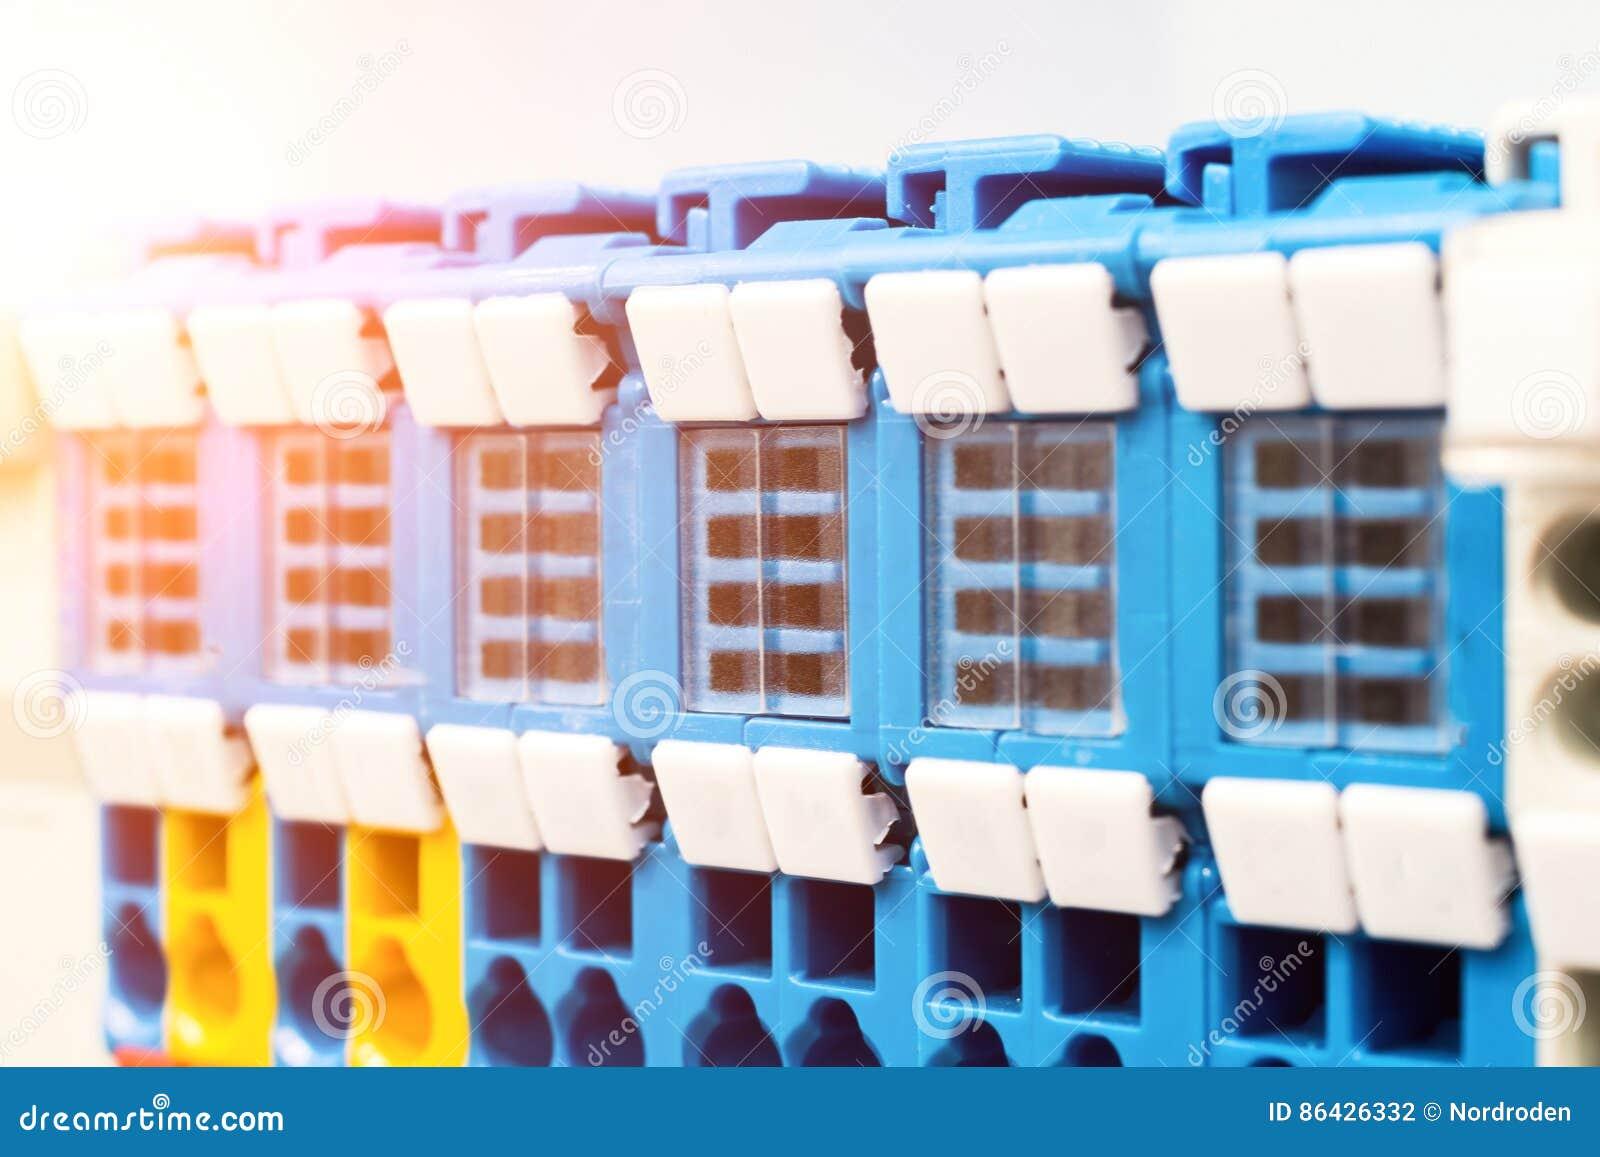 Close Up Wiring Connectors, Terminal Blocks. Stock Photo - Image of ...